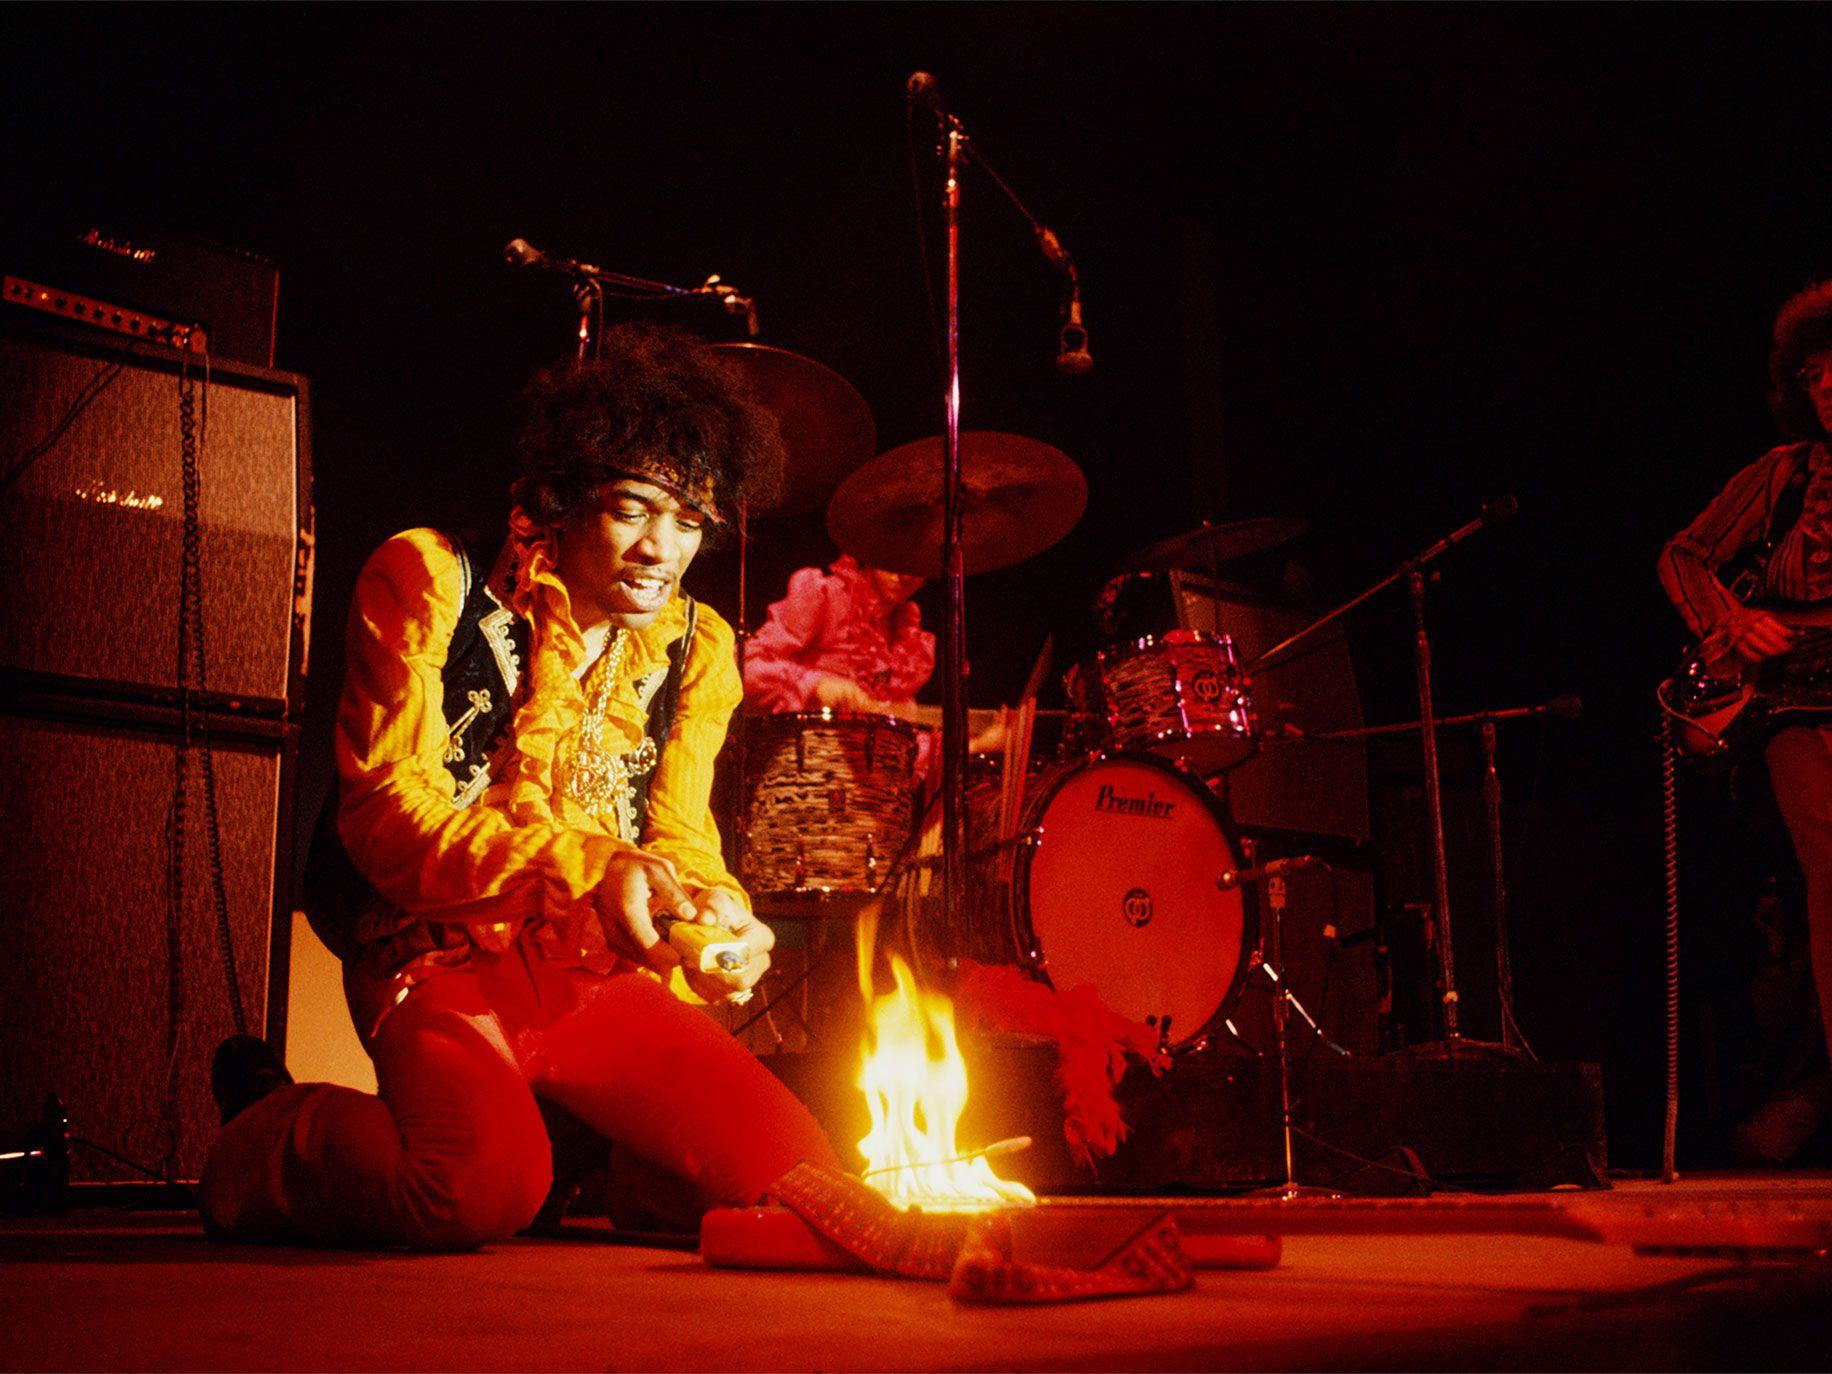 Jimi Hendrix lighting his guitar on fire, Monterey Pop Festival, Monterey, California, 1967.